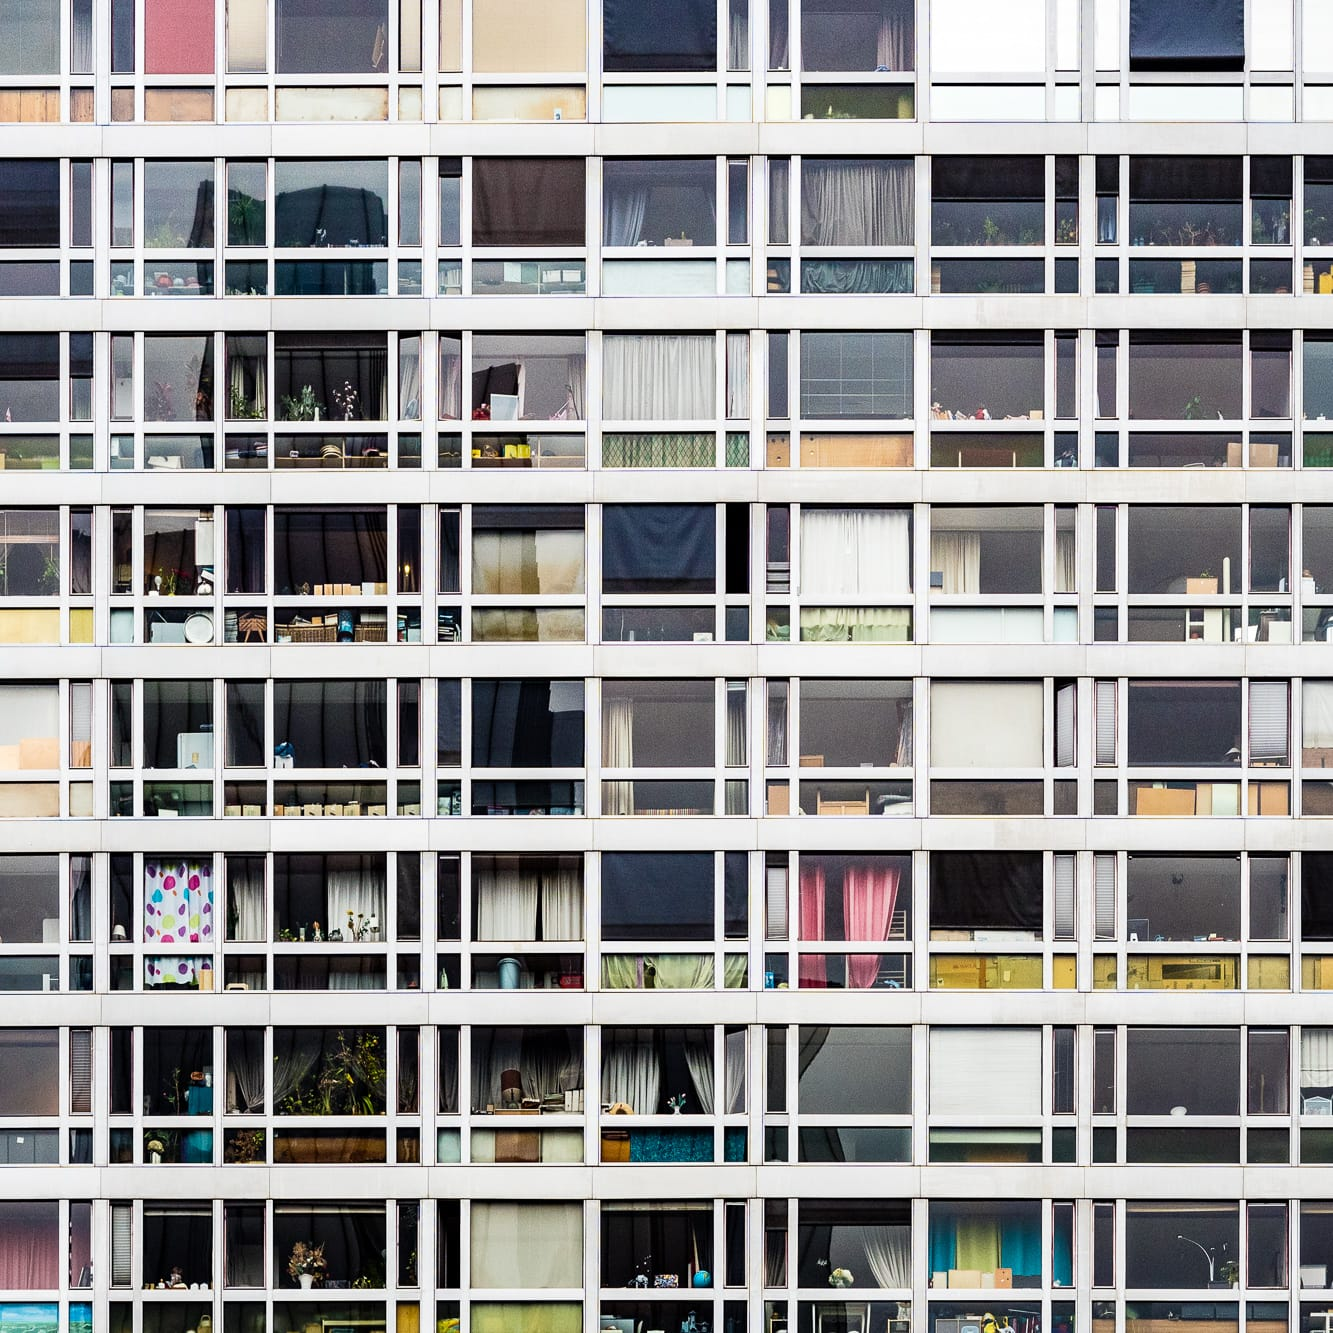 Architektur Fassade architektur fassaden querformat fotografie achim katzberg